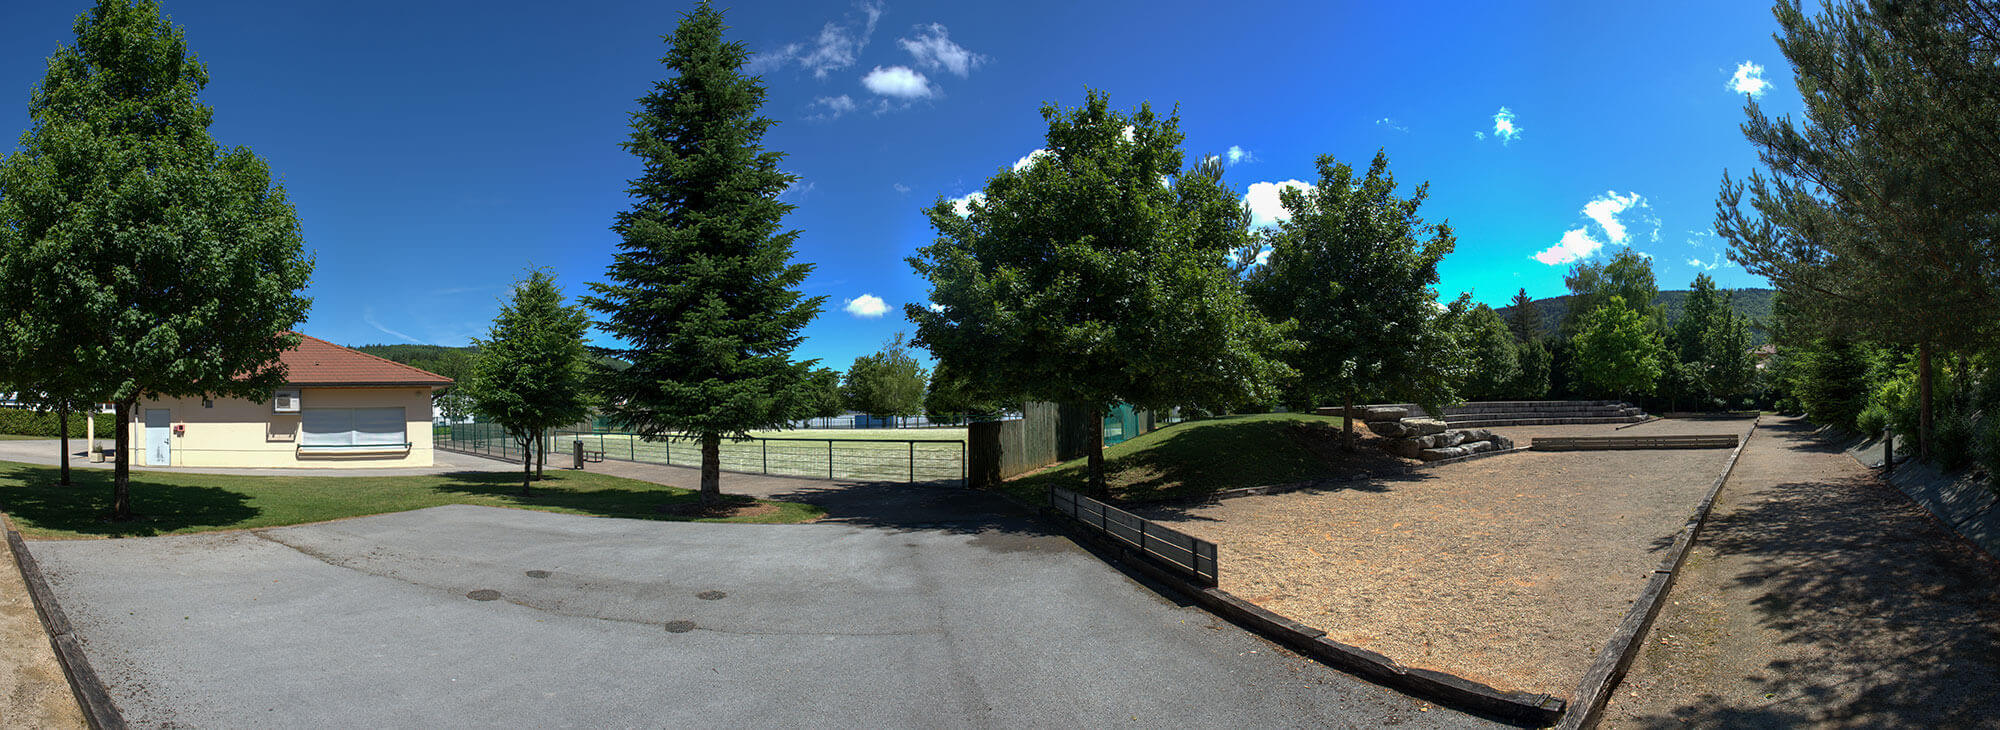 Panorama-parc-loisirs-2